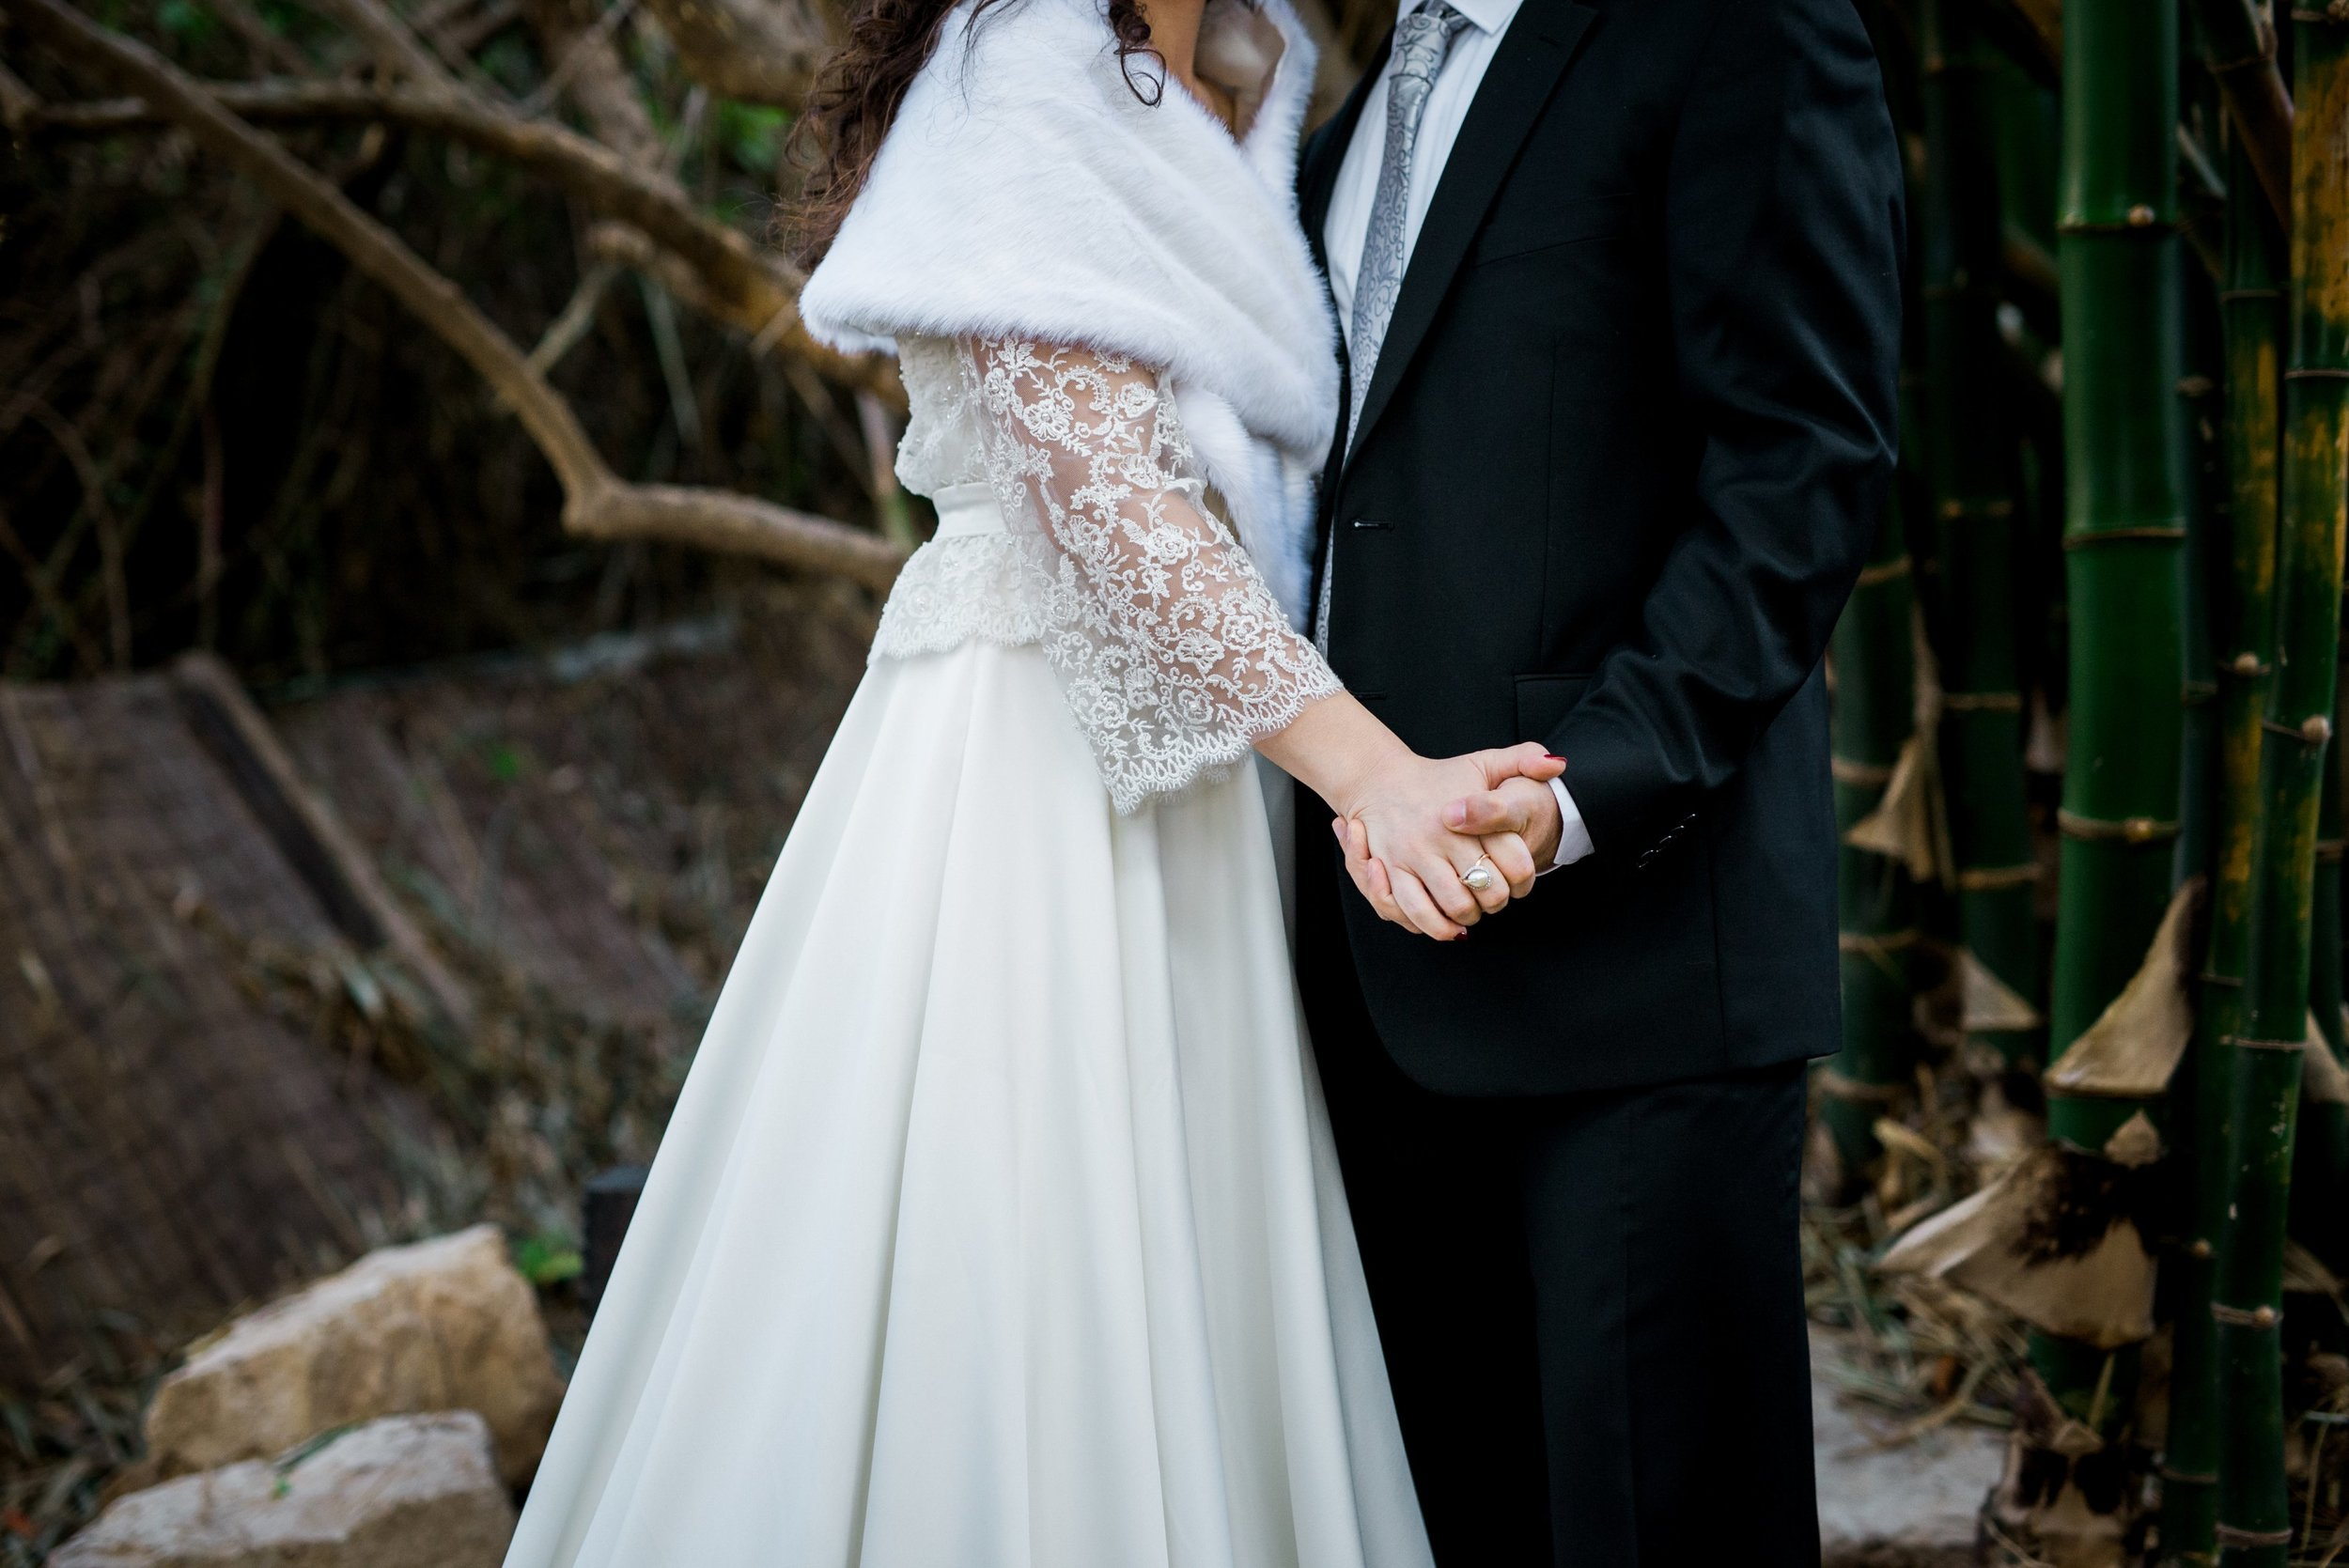 israel-garden-wedding-portraits-session-kate-giryes-photography--33_WEB.jpg